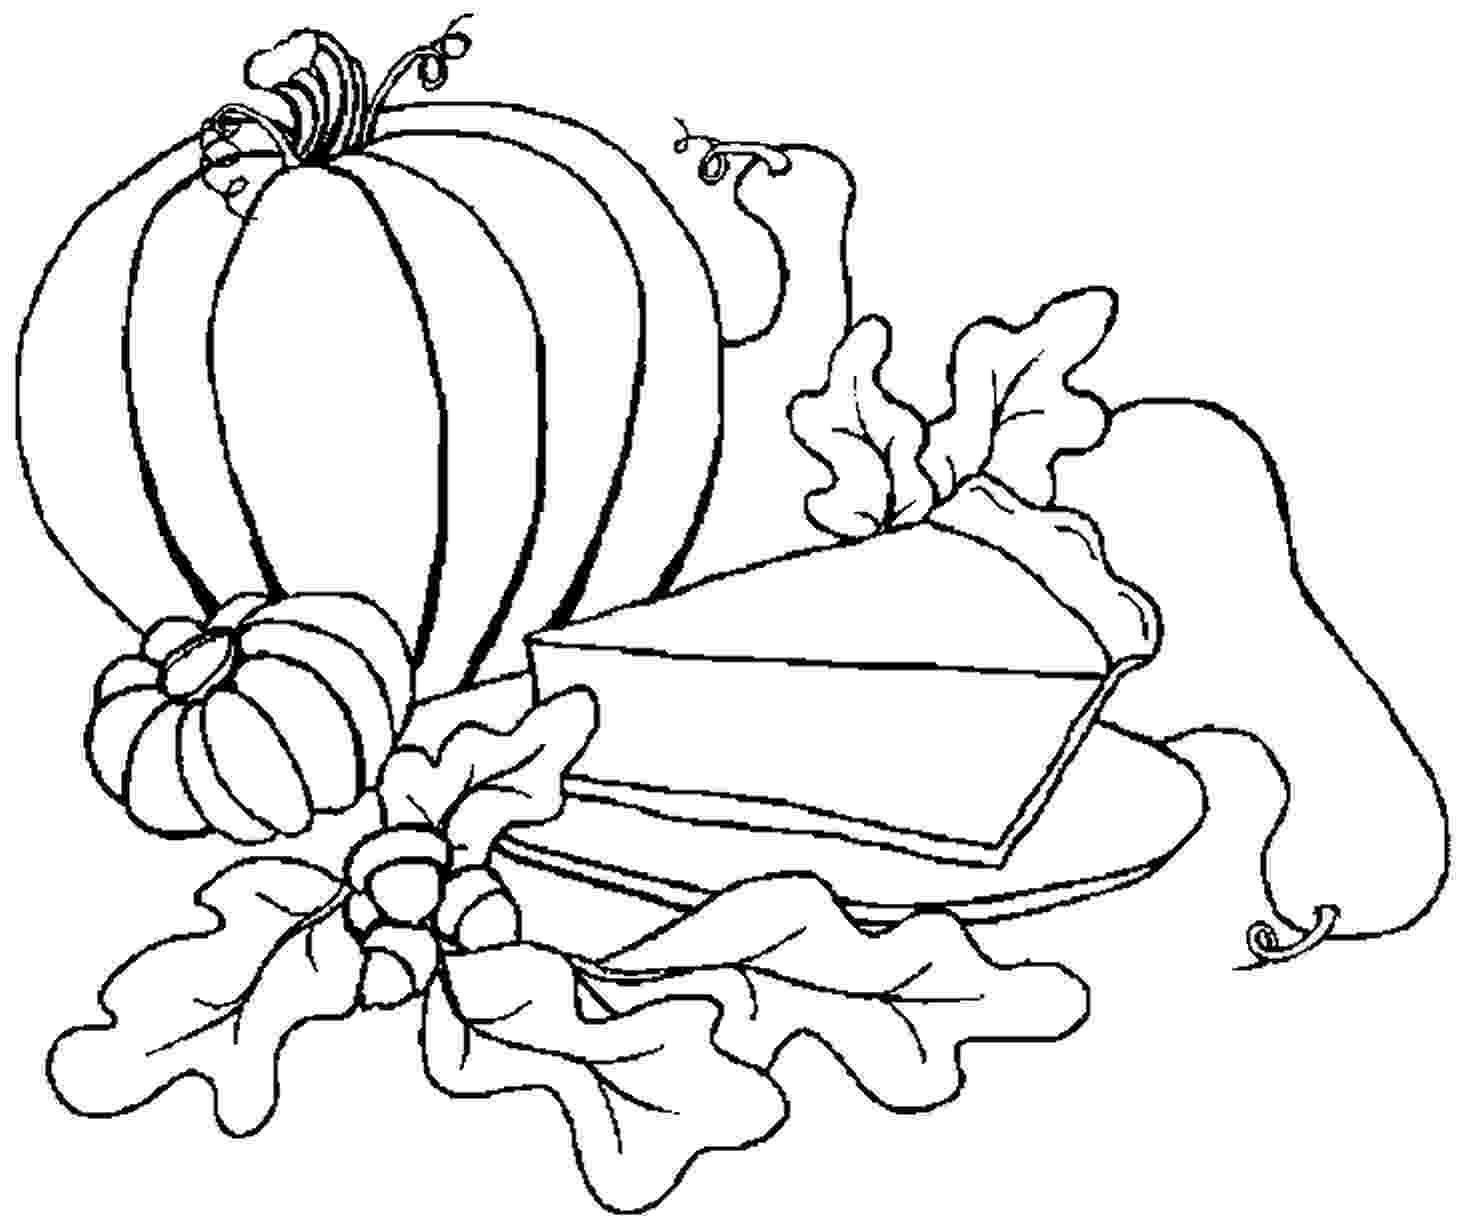 pumpkin color pages printable free printable pumpkin coloring pages for kids pumpkin pages printable color 1 2